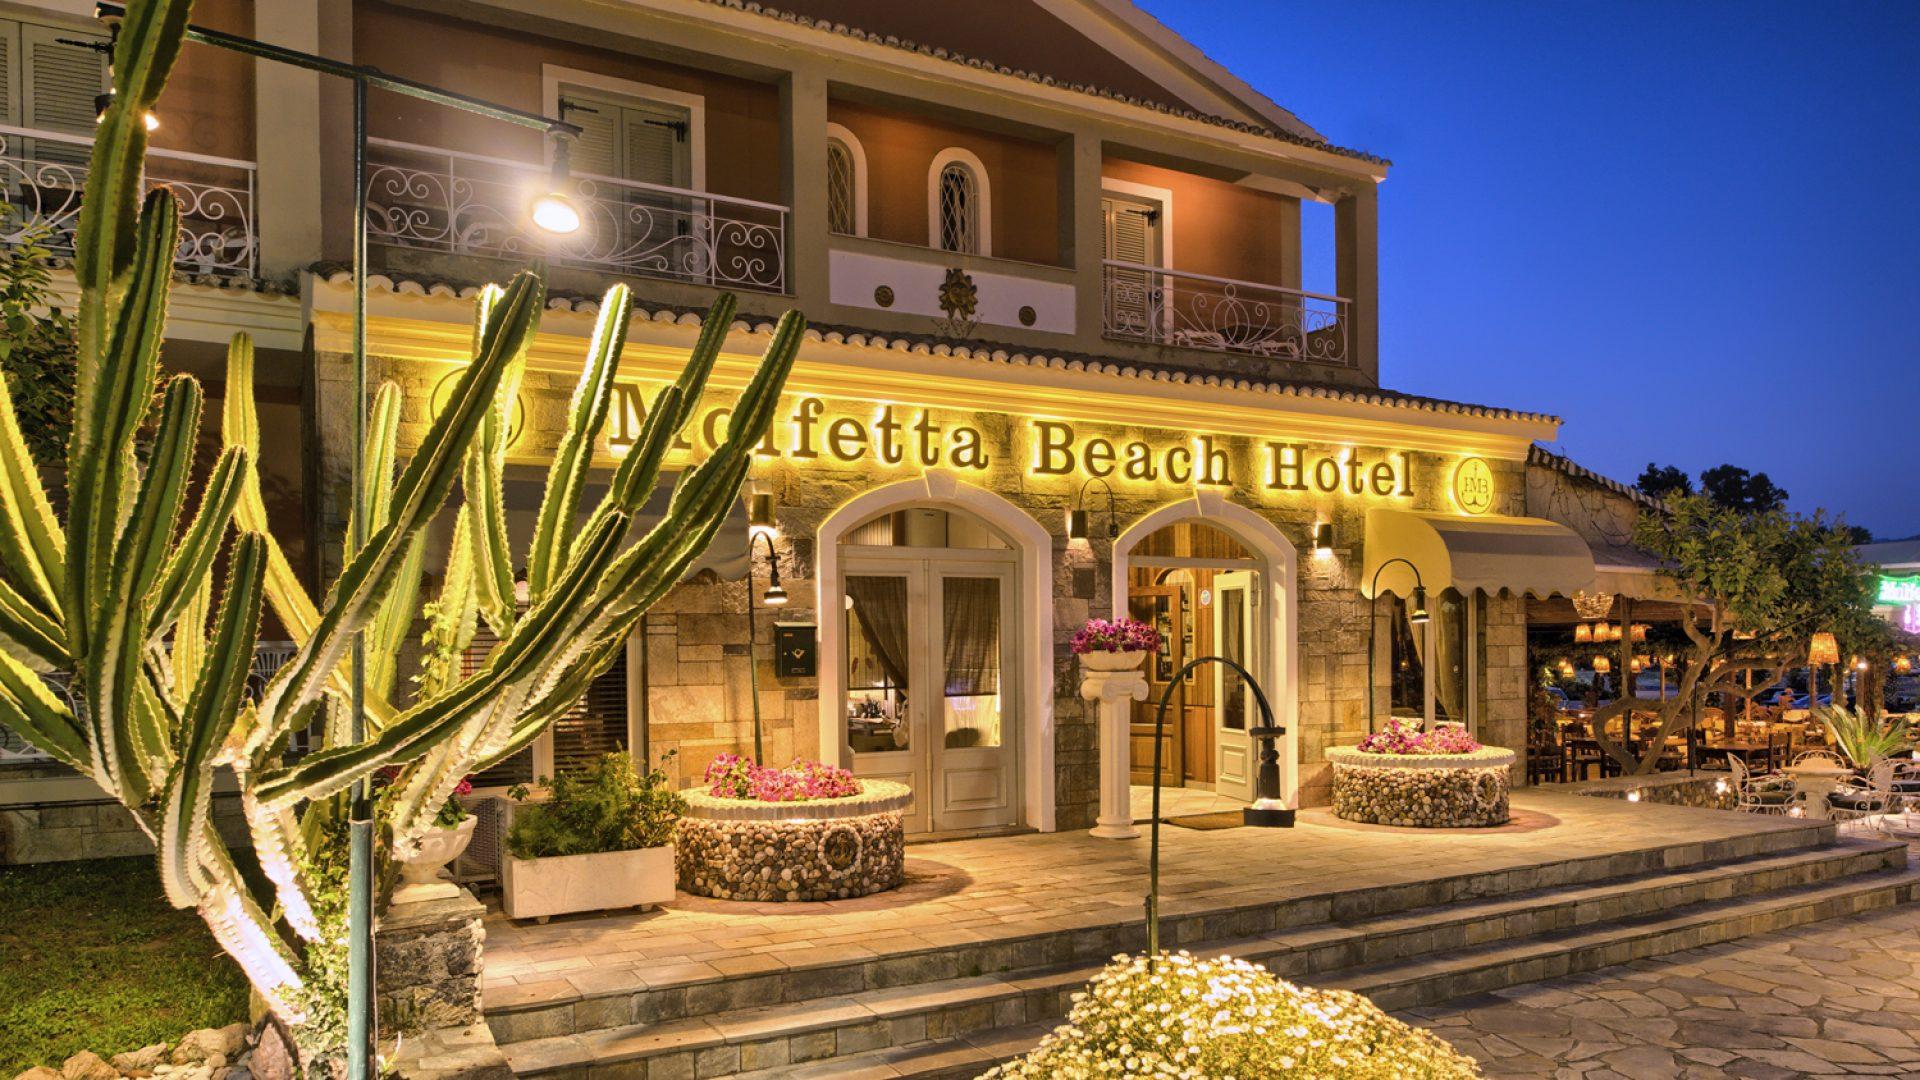 Molfetta Beach Hotel - Κερκυρα ✦ 2 Ημερες (1 Διανυκτερευση) ✦ 2 ατομα ✦ Πρωινο ✦ 01/09/2021 εως 30/09/2021 ✦ Μπροστα στην παραλια!